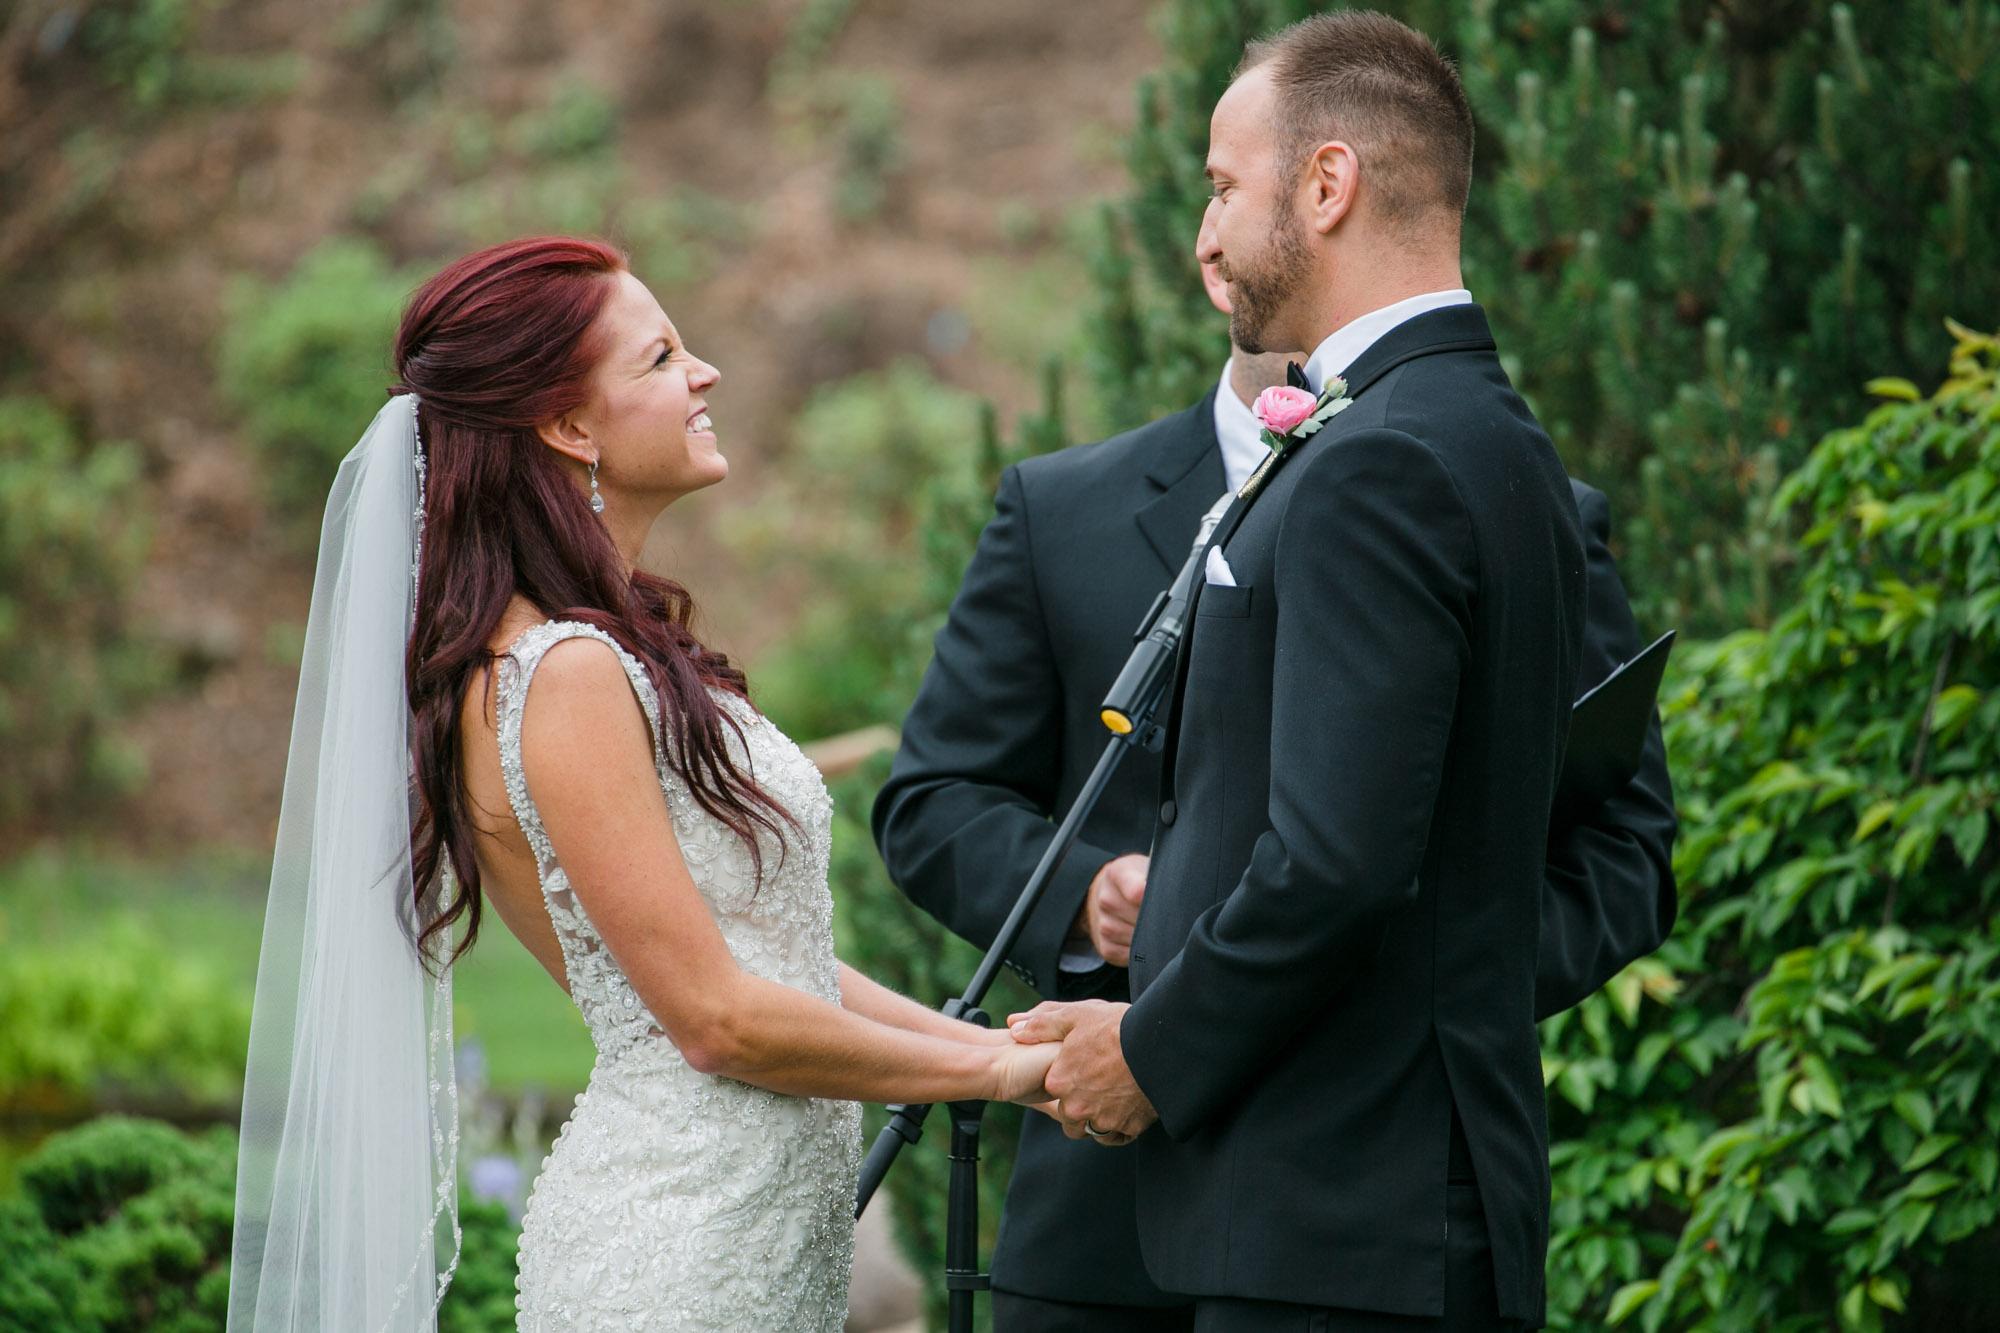 hensville-wedding-downtown-toledo-ohio (47 of 103).jpg